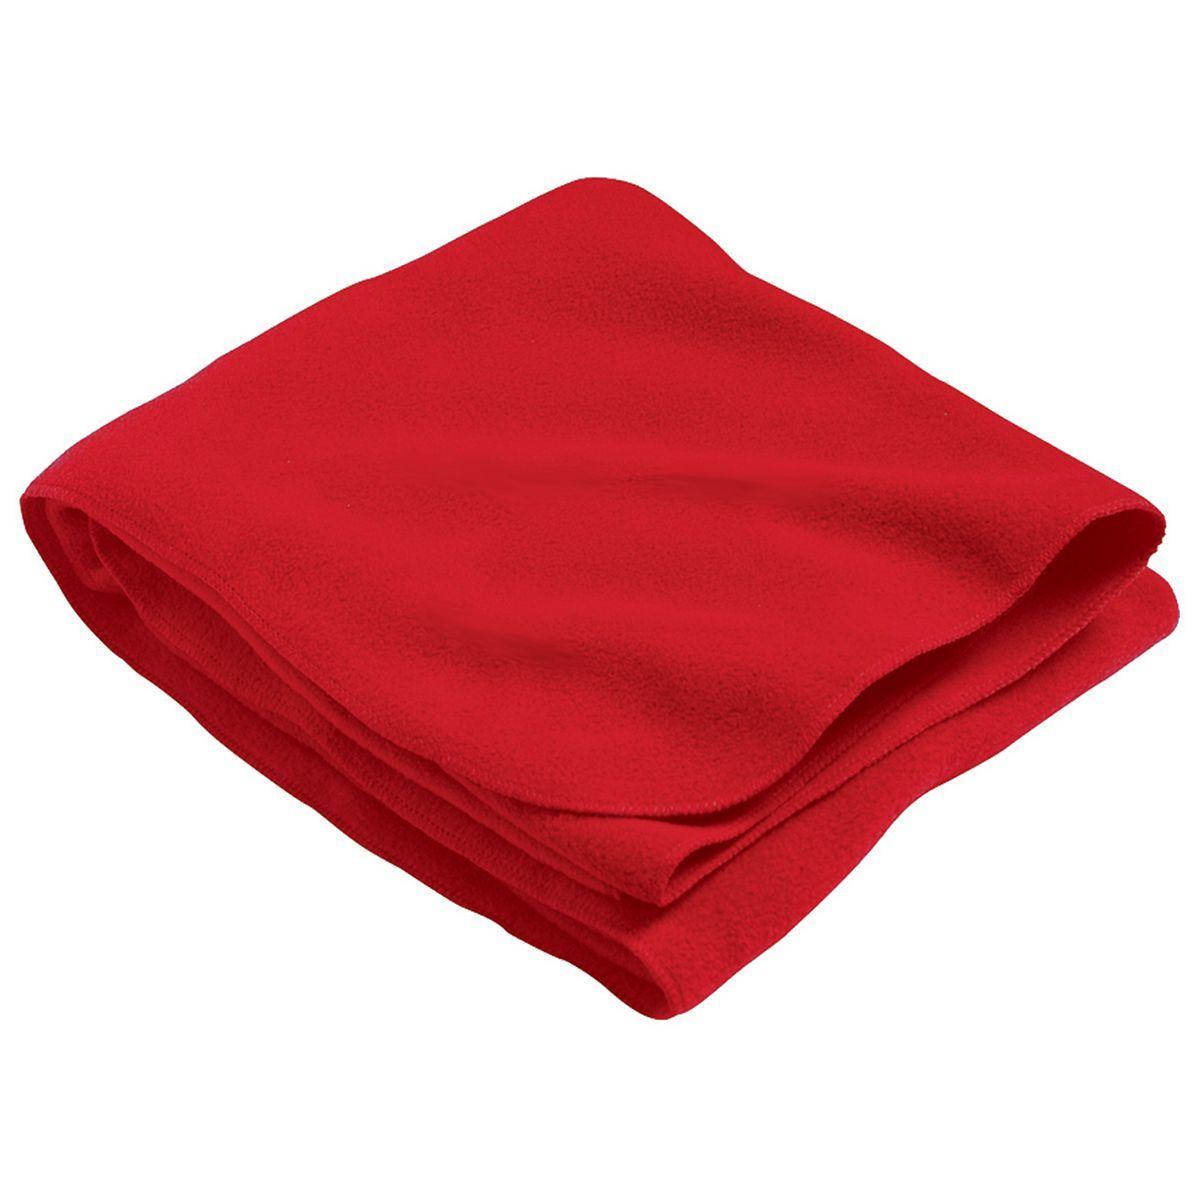 Stadium Blanket - SCARLET